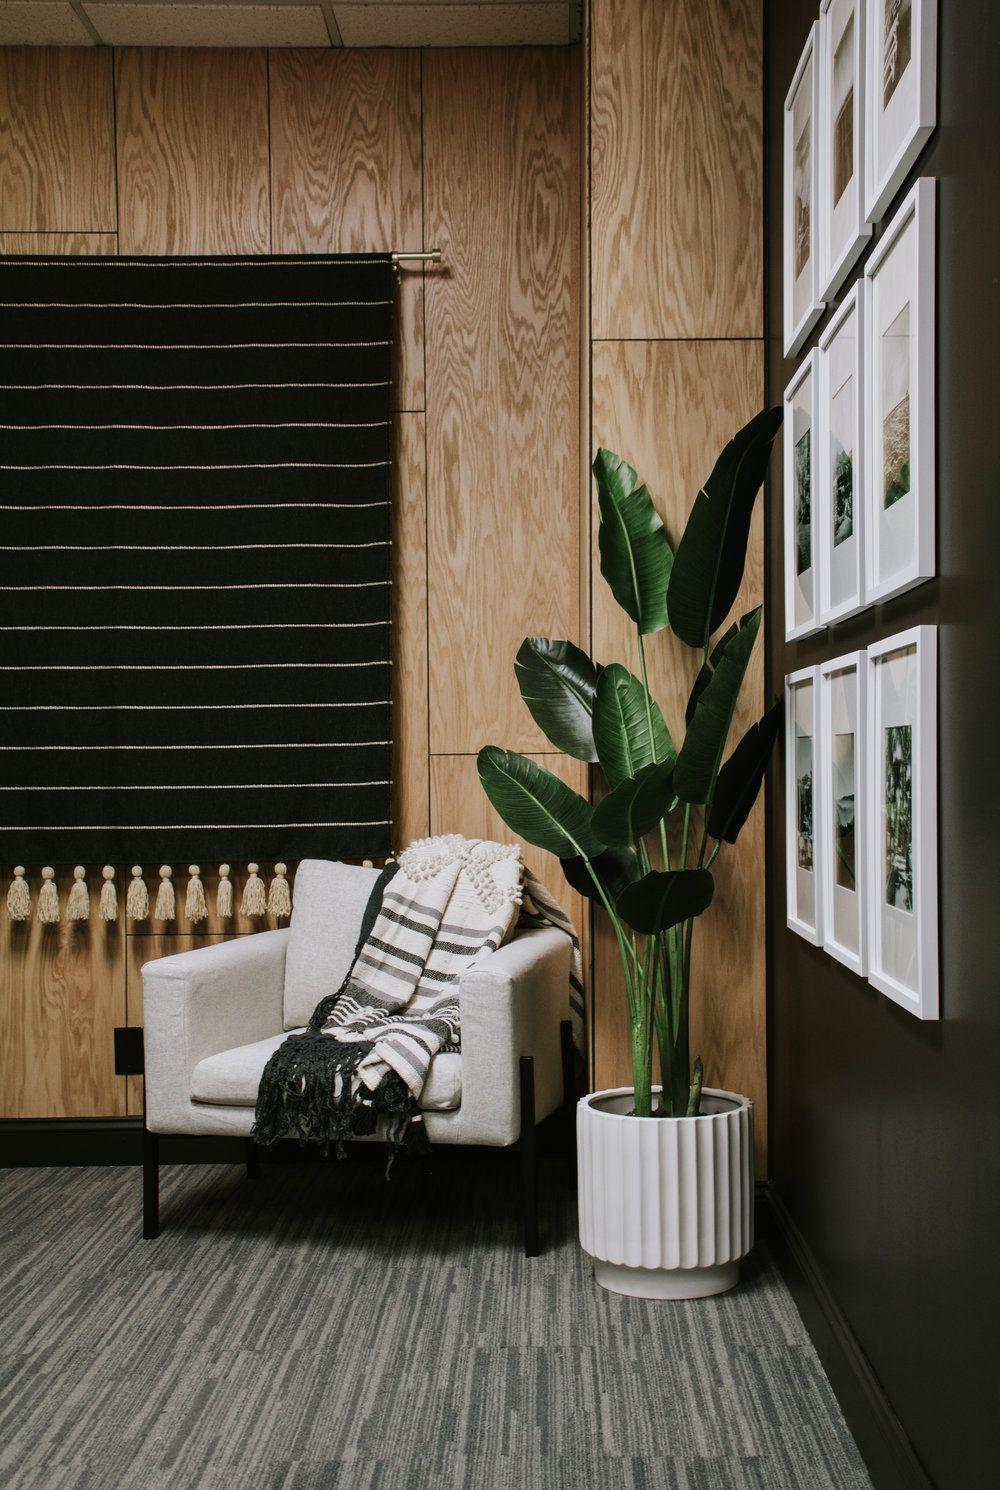 Speak Podcast Studio Reveal Before After Interior Design